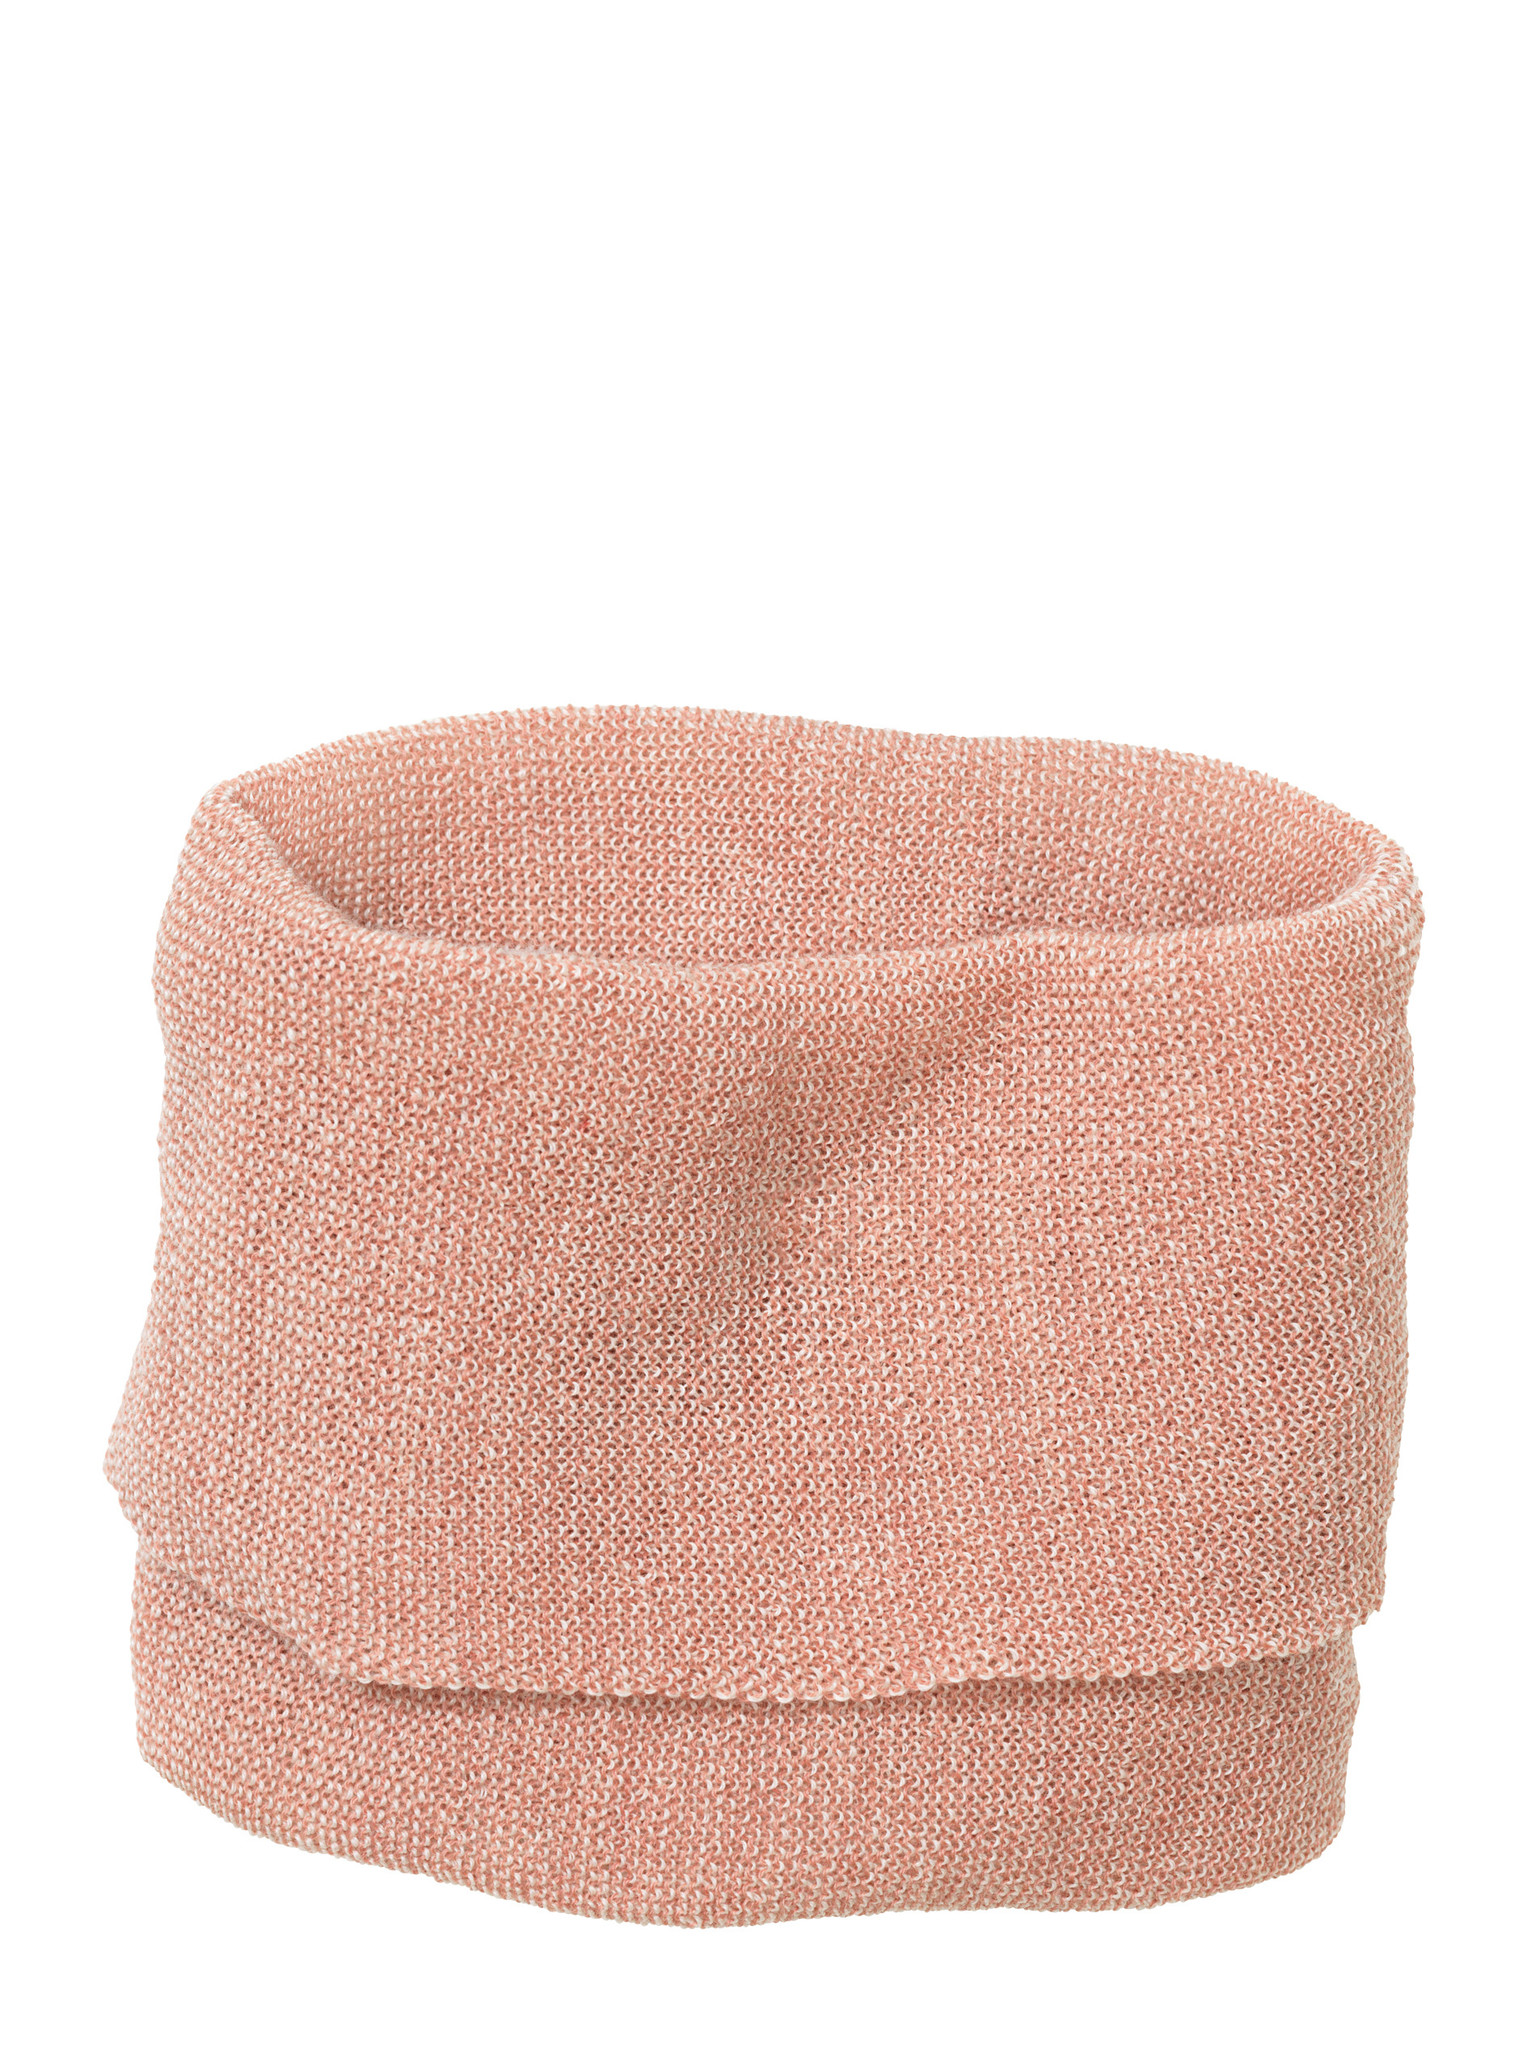 Disana Disana Tube scarf -100% wol - Rosé/Naturel (931)